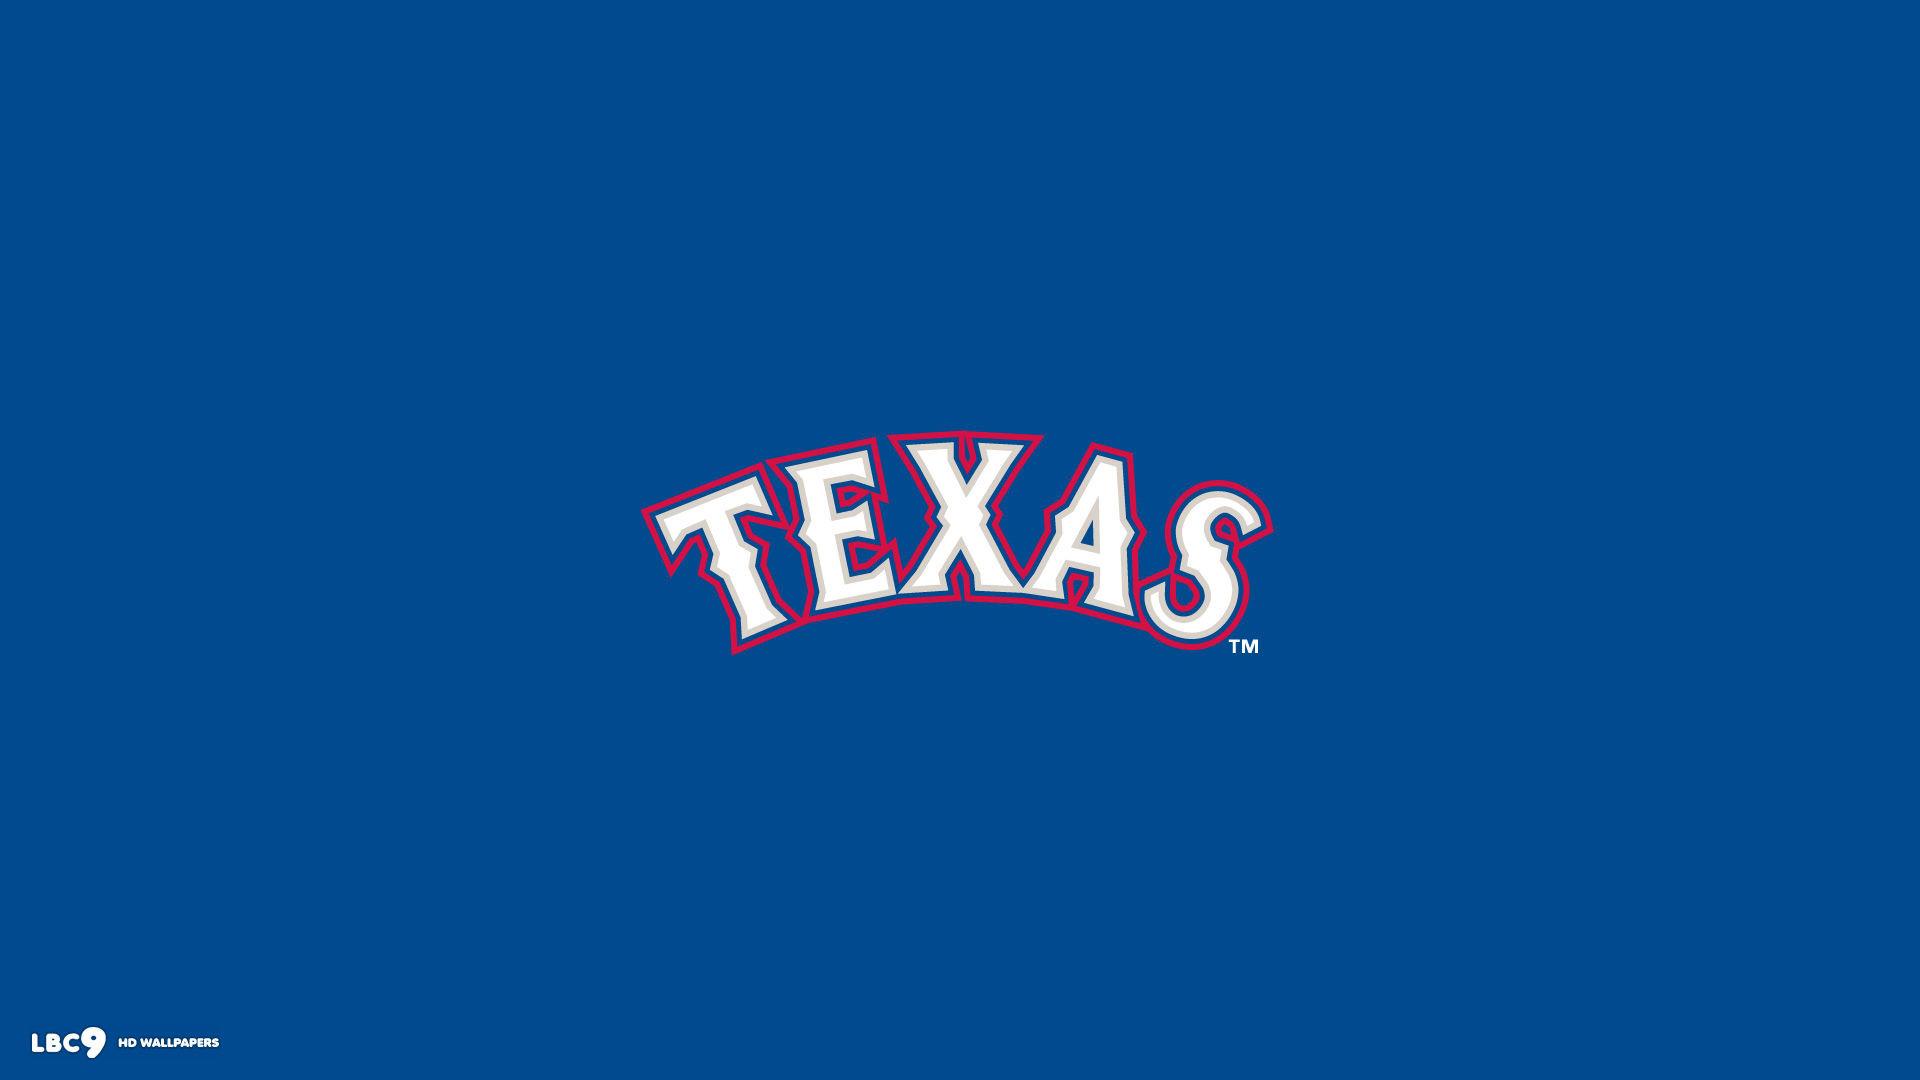 HD Josh Hamilton Texas Rangers Wallpapers   HD Wallpapers   Pinterest    Wallpaper and Iphone wallpaper pinterest